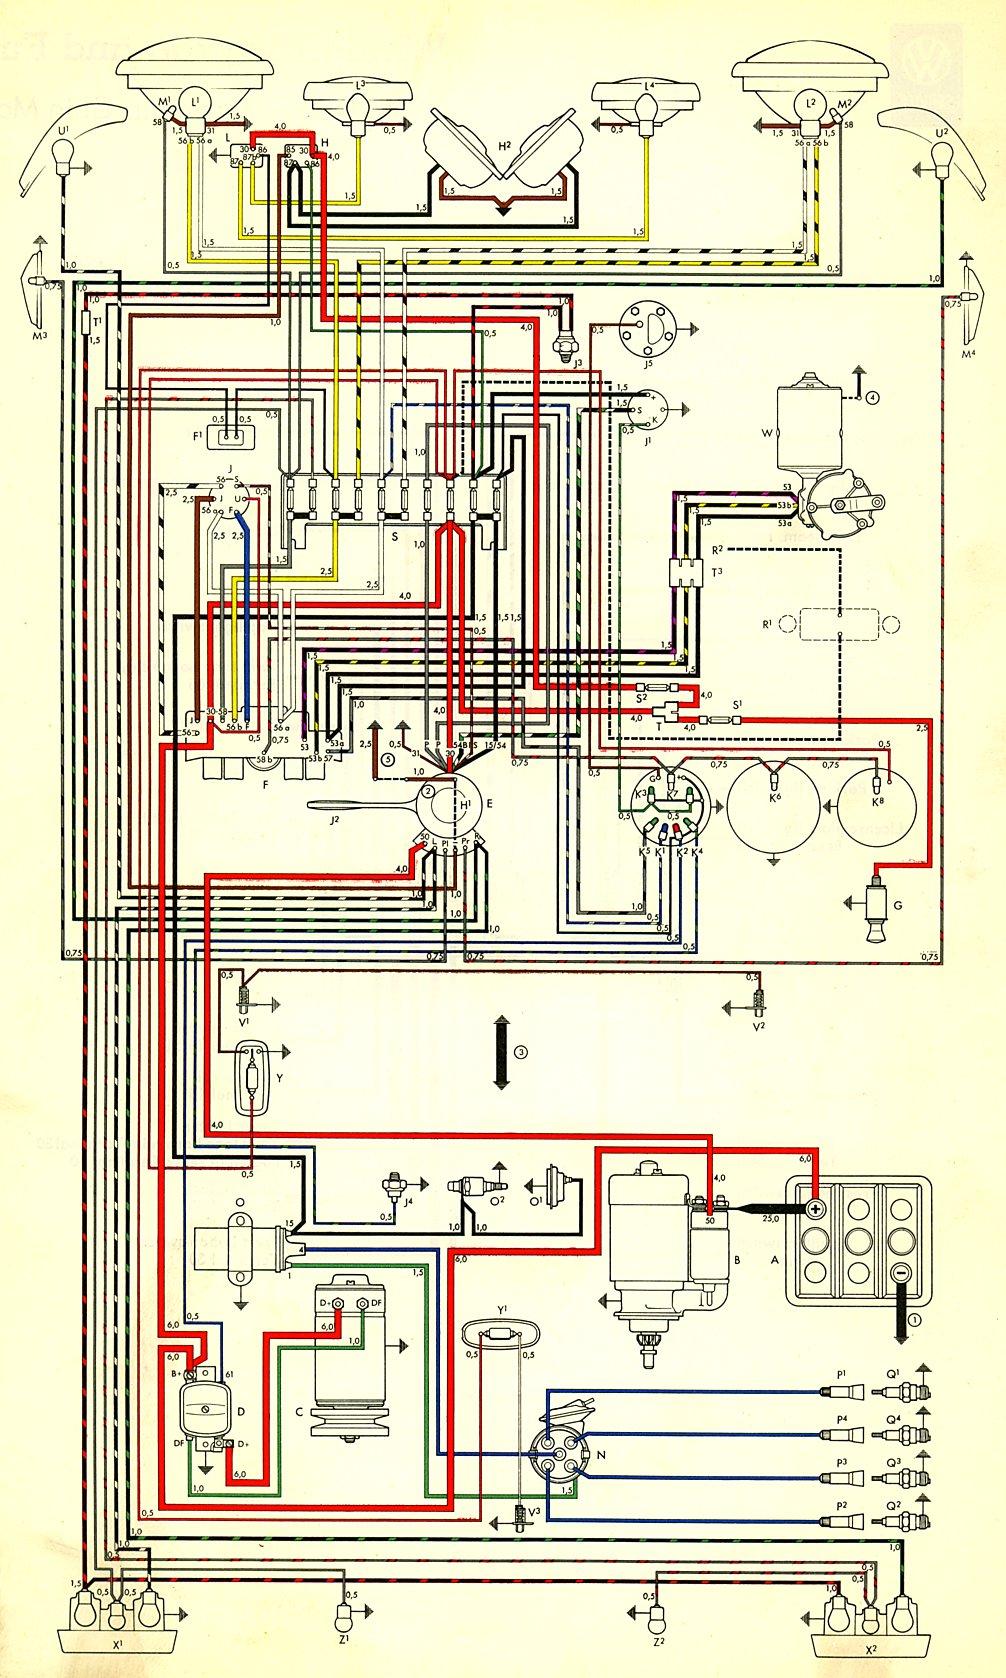 g body ac wiring diagram 2000 ford mustang gt radio thesamba com type 3 diagrams